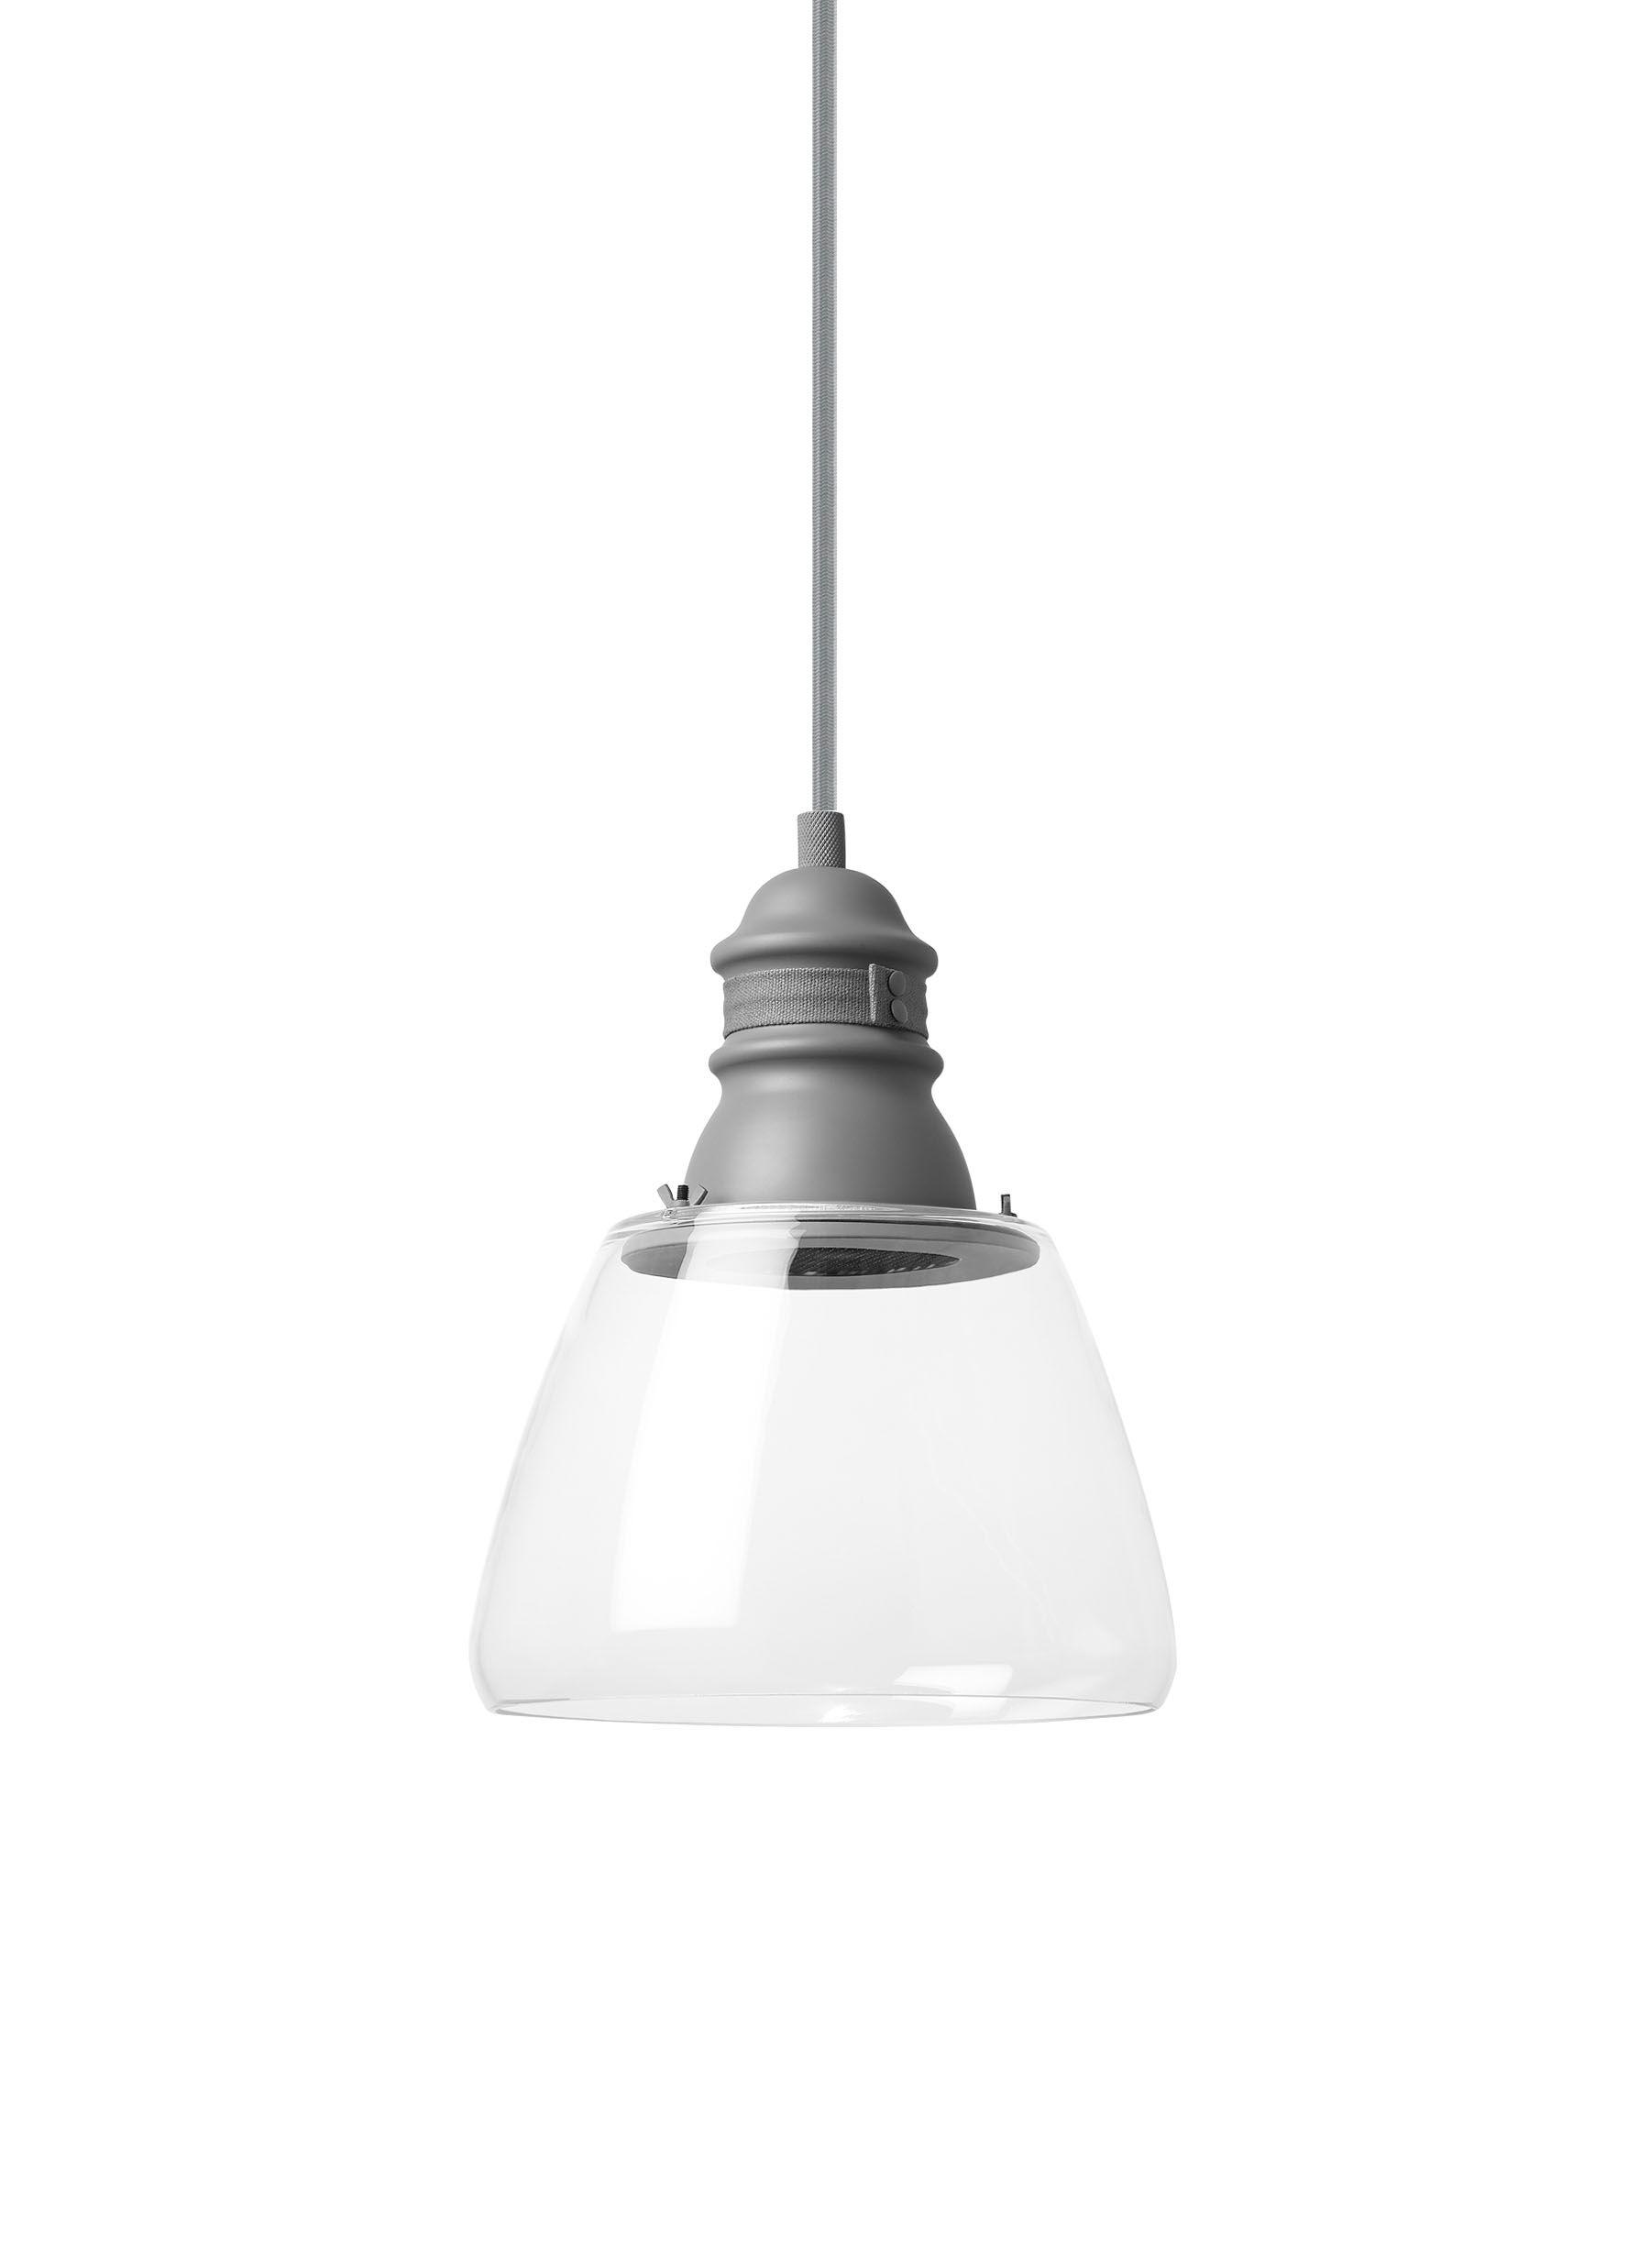 Holton 1-Light Mini Pendant Shade Color: Clear, Bulb Type: LED30, Finish: Gray